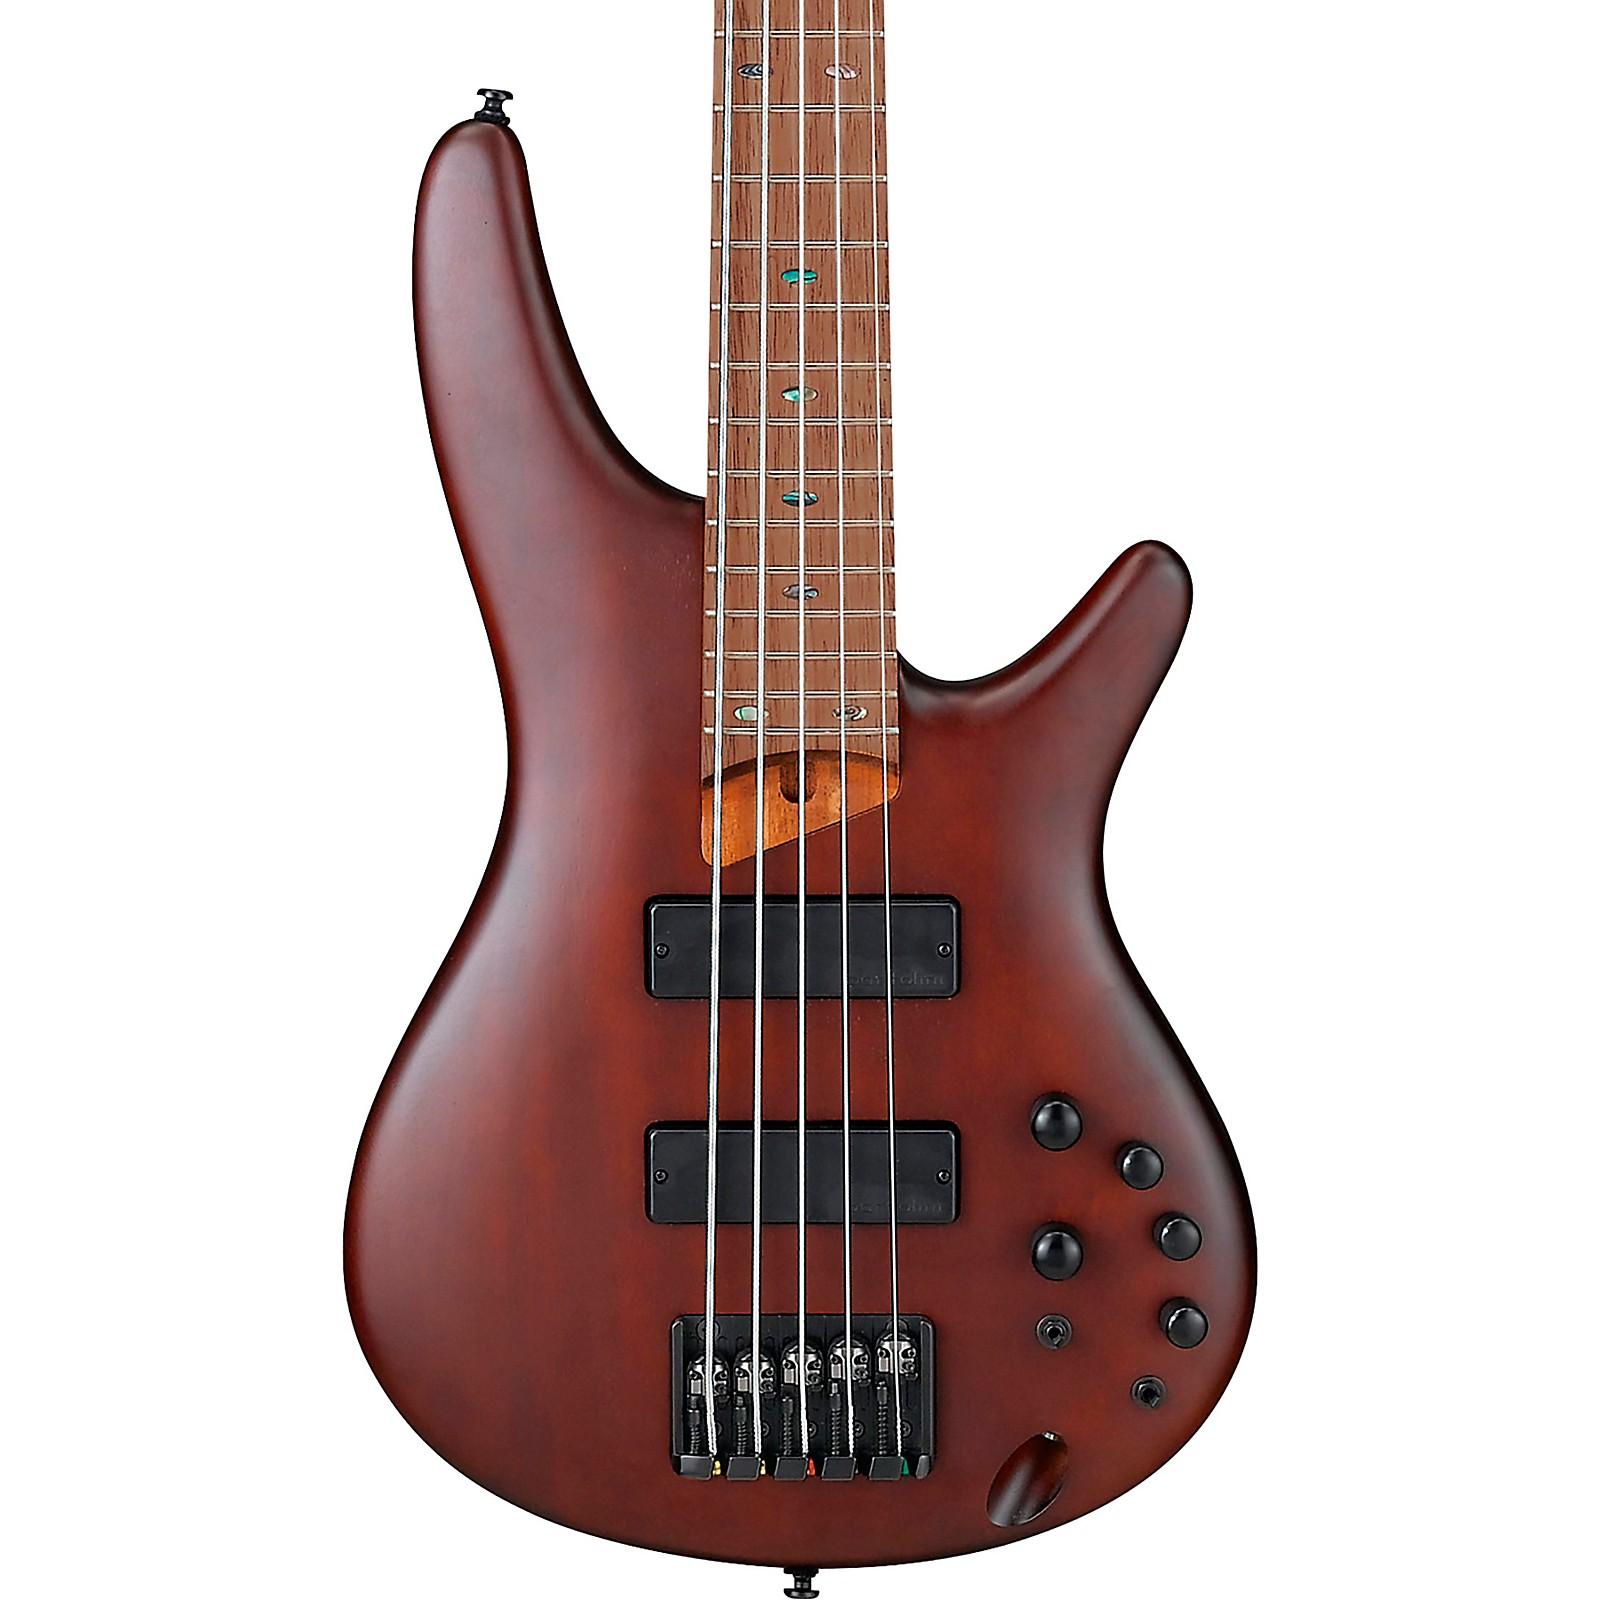 Ibanez SR505EZW 5-String Electric Bass Guitar